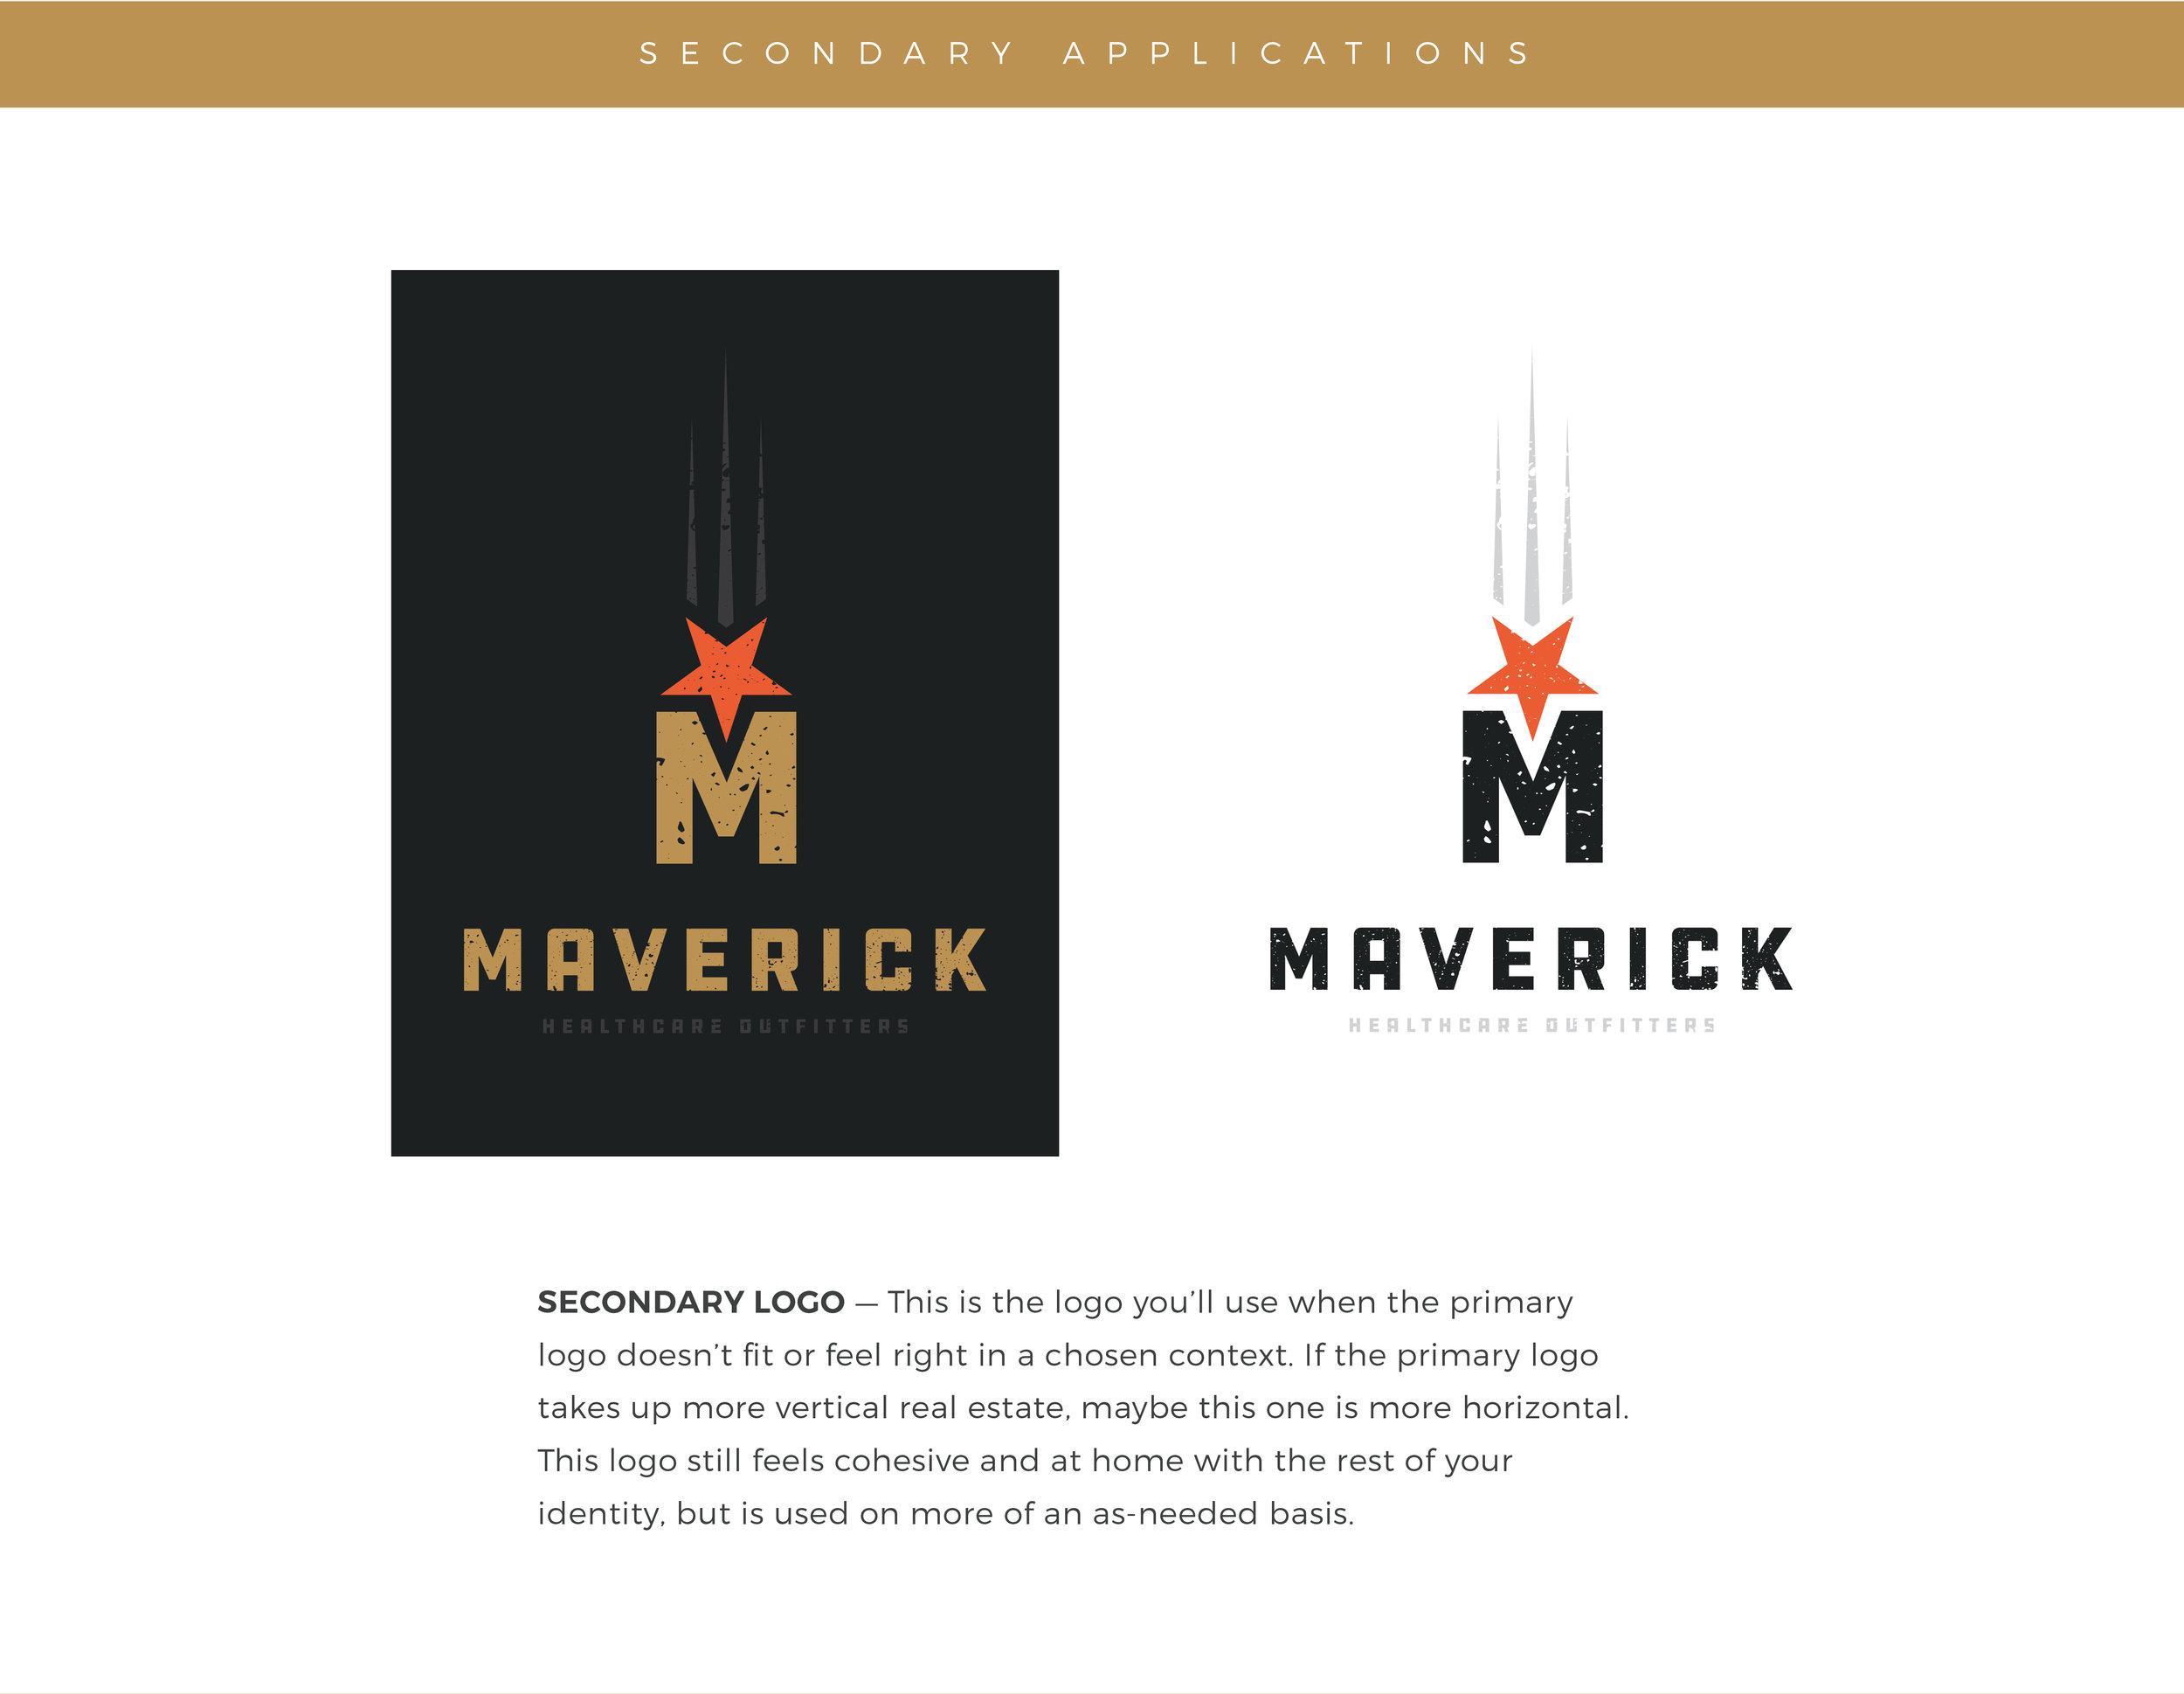 Maverick_Style_Guide_4_12_18-1_03.jpg